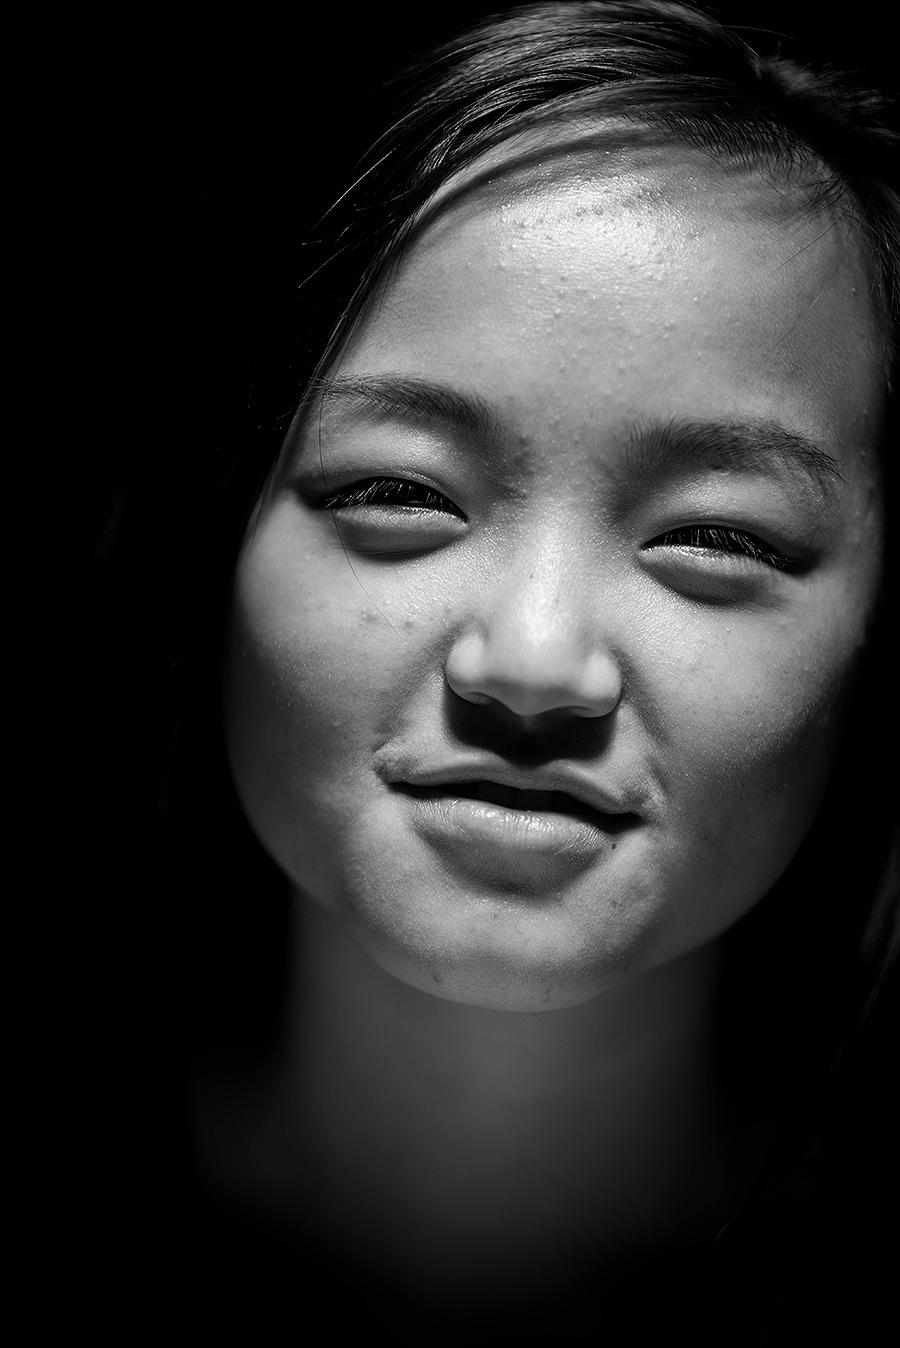 Erina_love_photography_model_photo_emotion_portrait_headshot_kaleb_germinaro